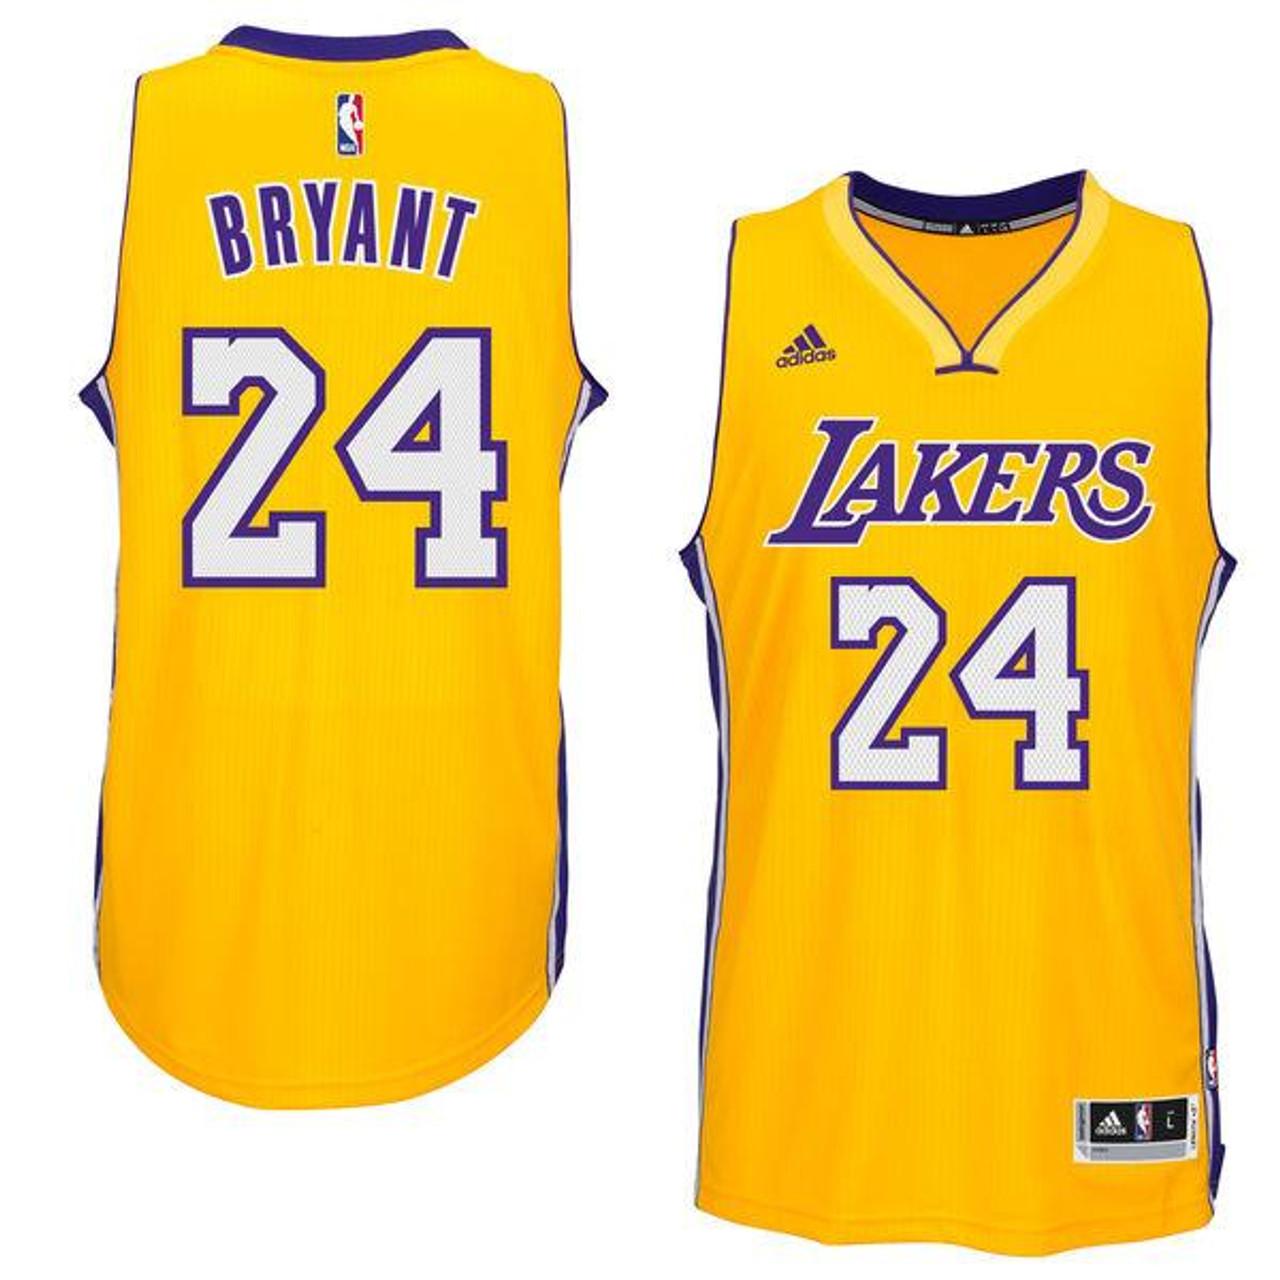 Los Angeles Lakers Kobe Bryant #24 Yellow Adidas Jersey